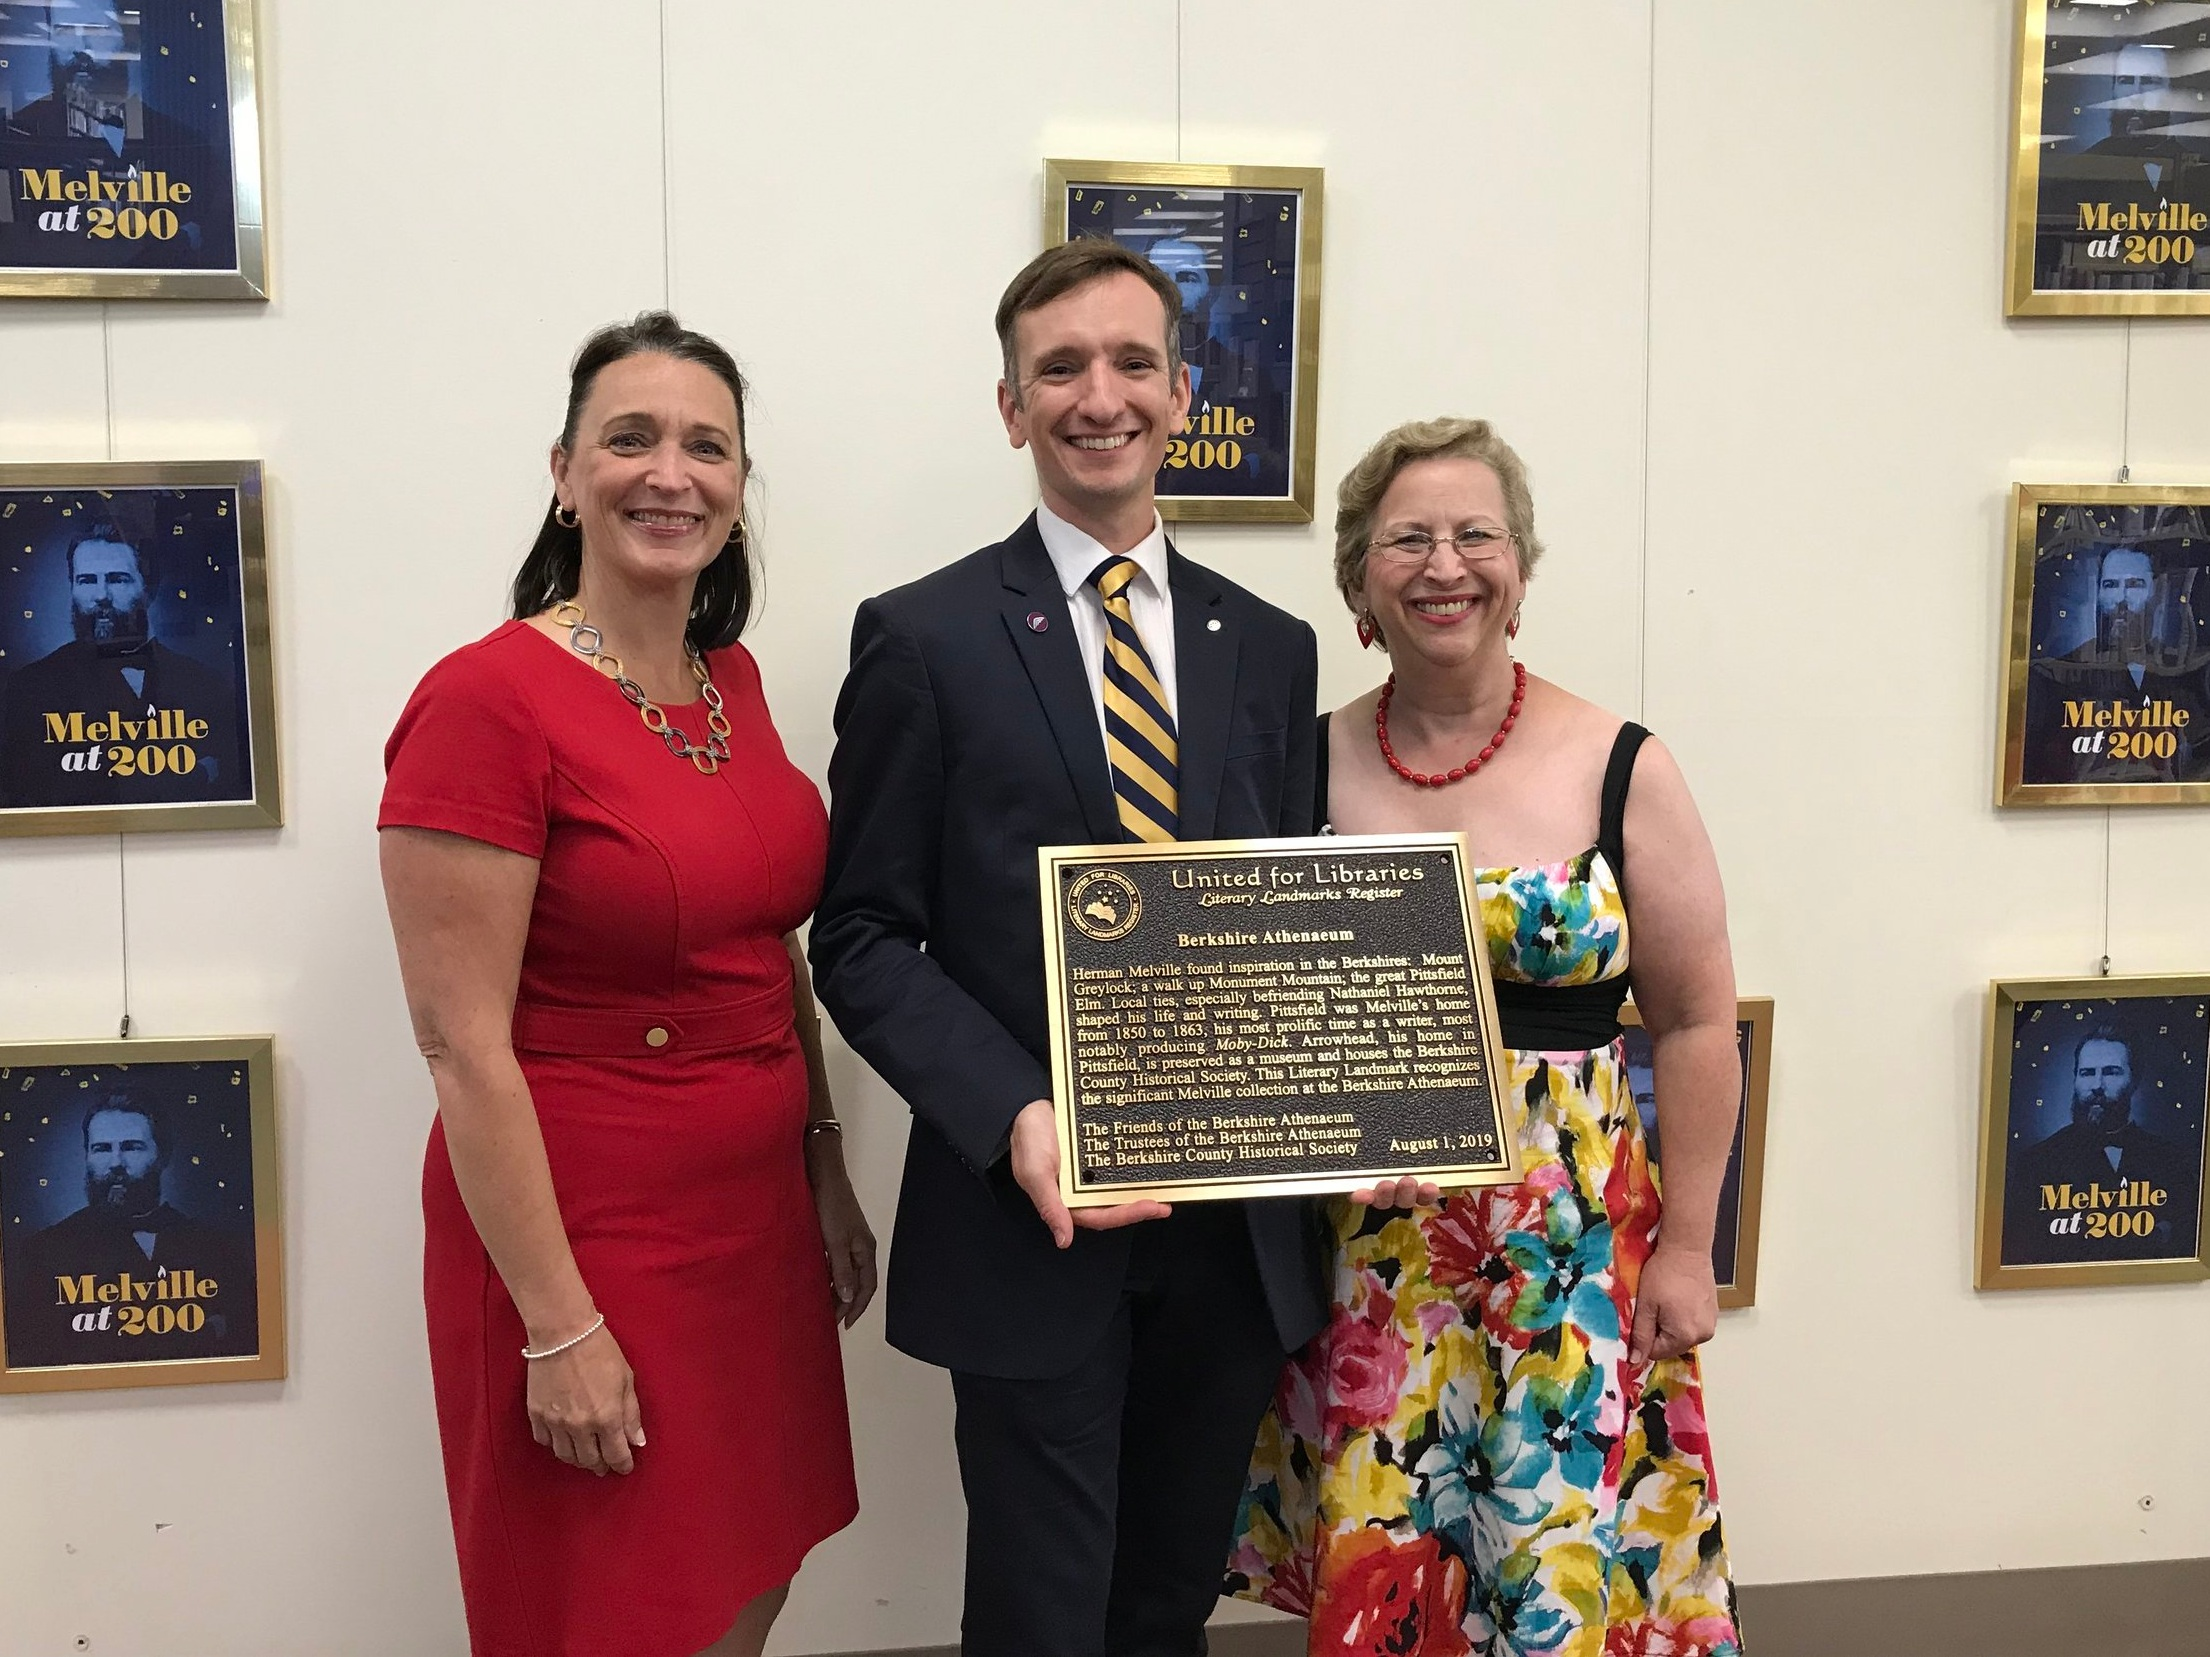 Pittsfield Mayor Linda Tyer, Berkshire Athenaeum Director Alex Reczkowski, and Friends of the Berkshire Athenaeum President Amy Chin with the Literary Landmark plaque